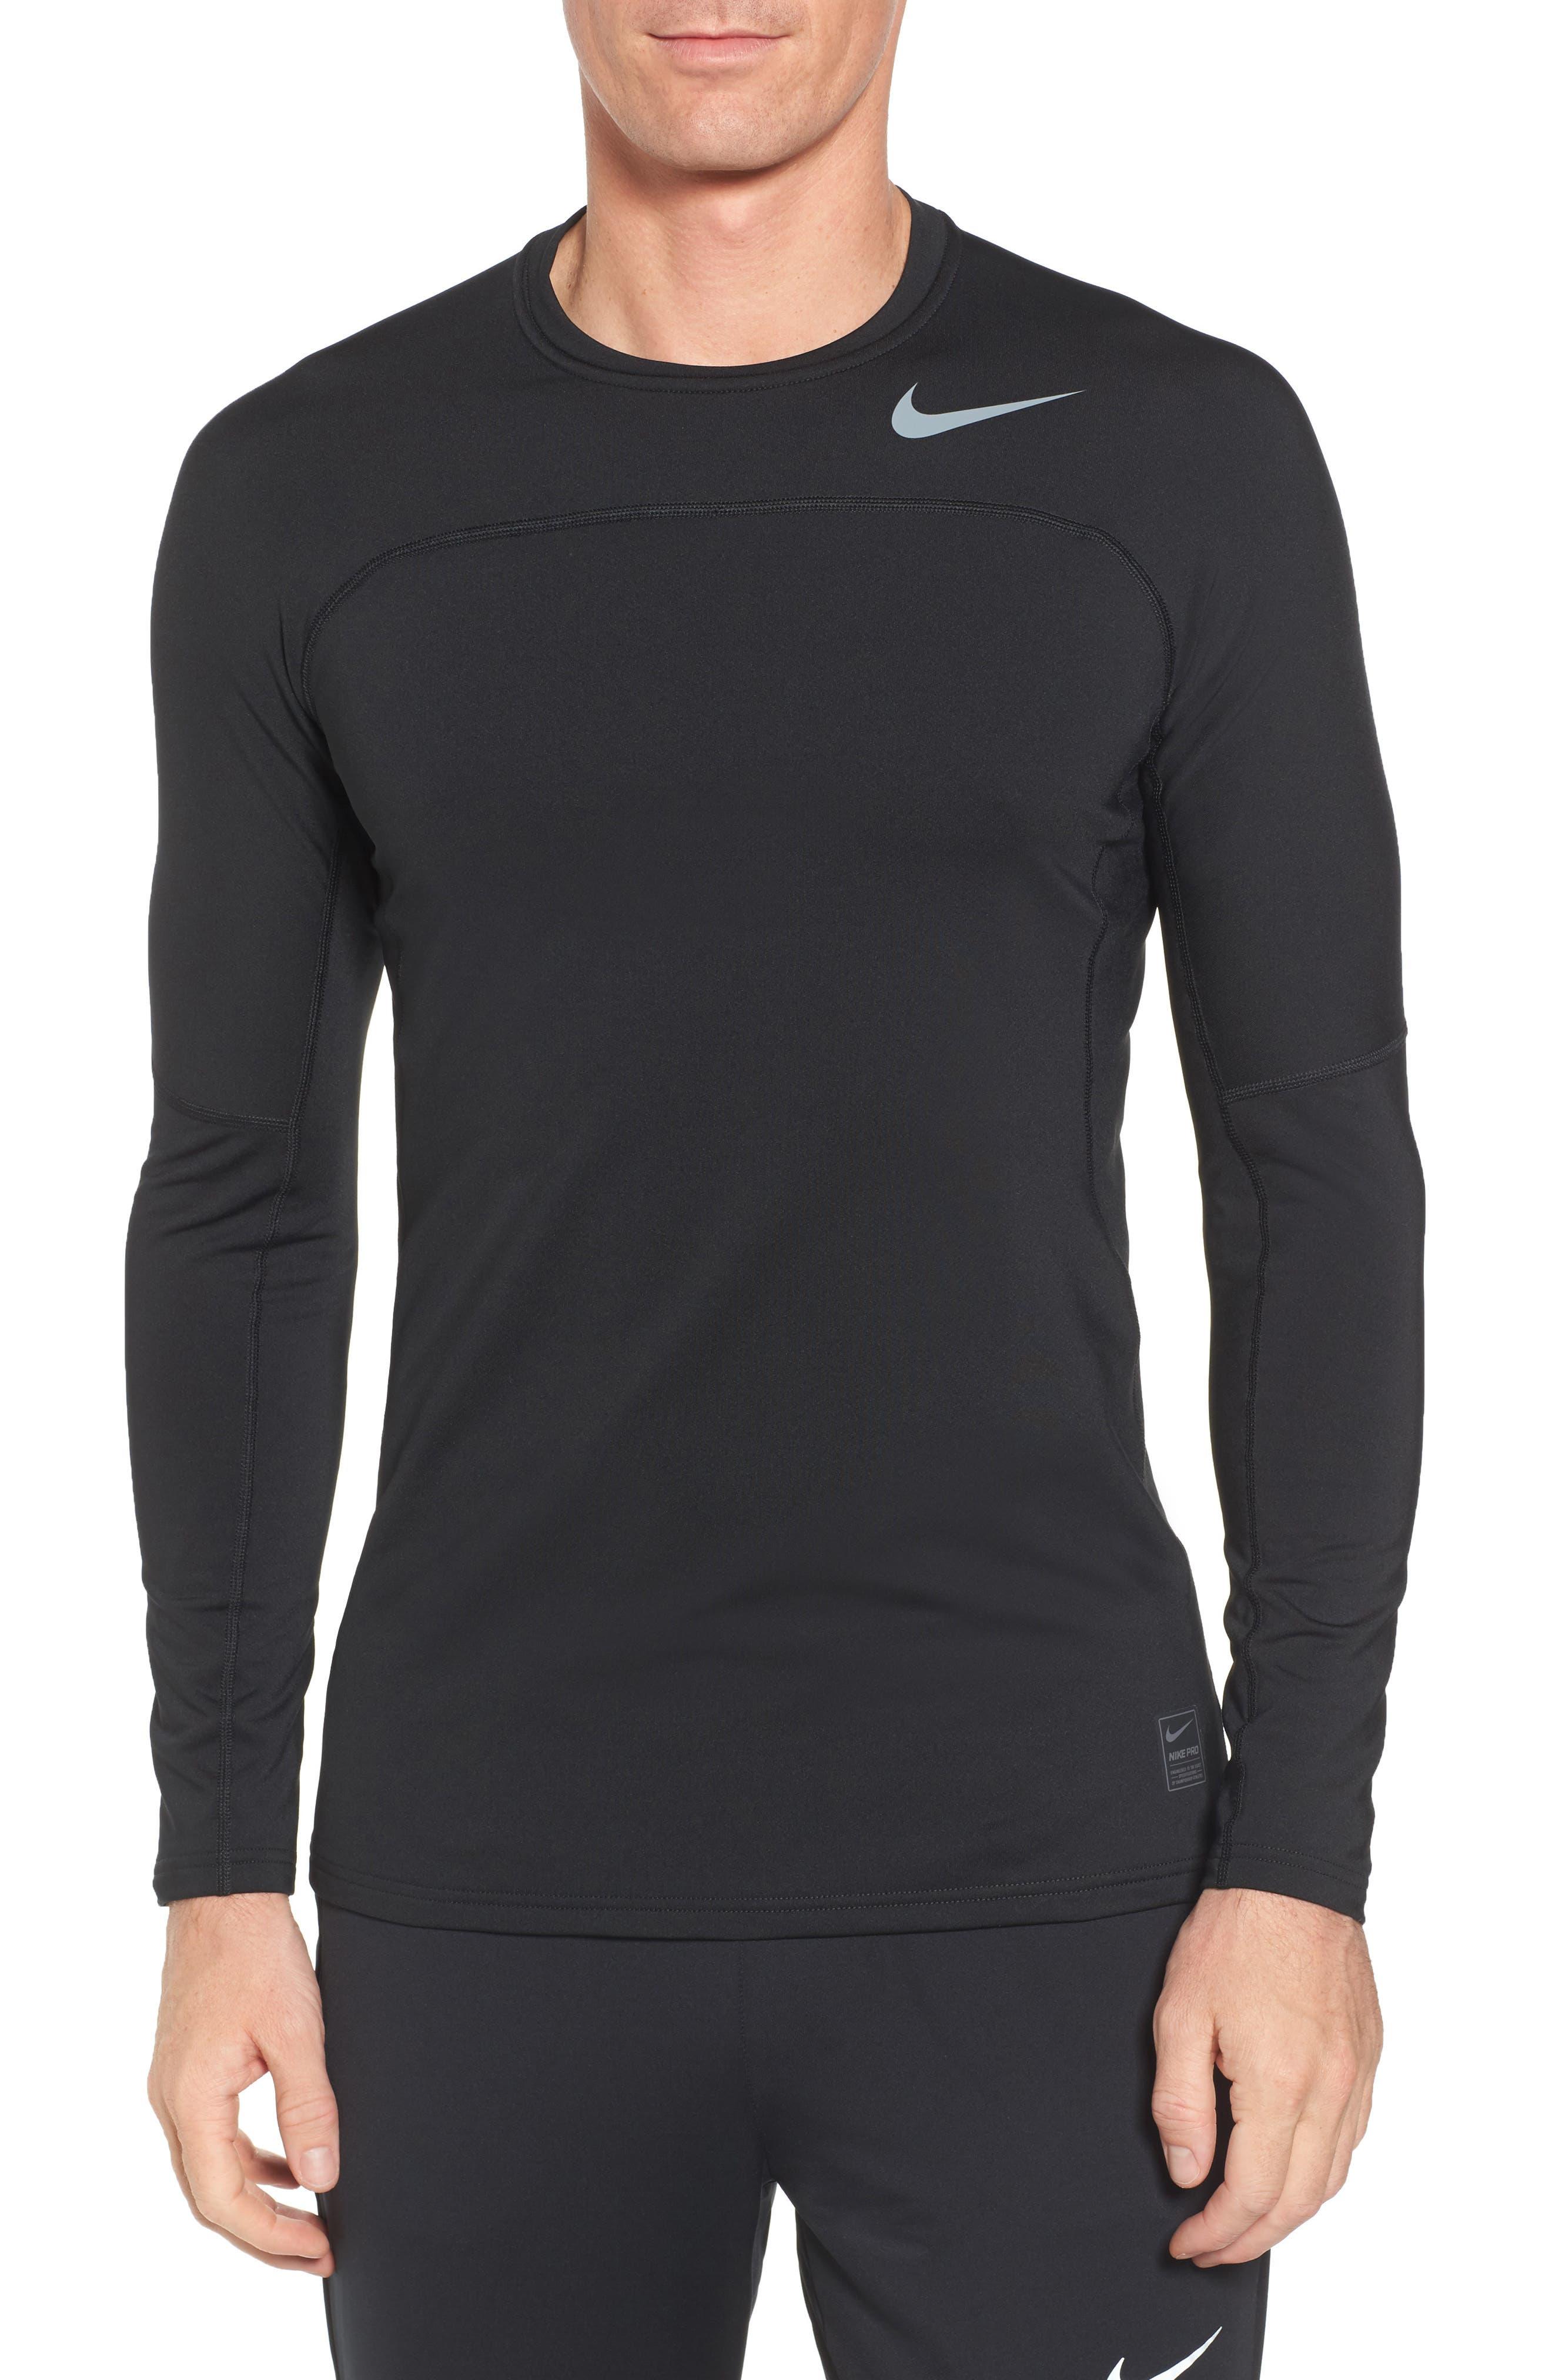 Pro Long Sleeve Training T-Shirt,                             Main thumbnail 1, color,                             Black/ Cool Grey/ Cool Grey